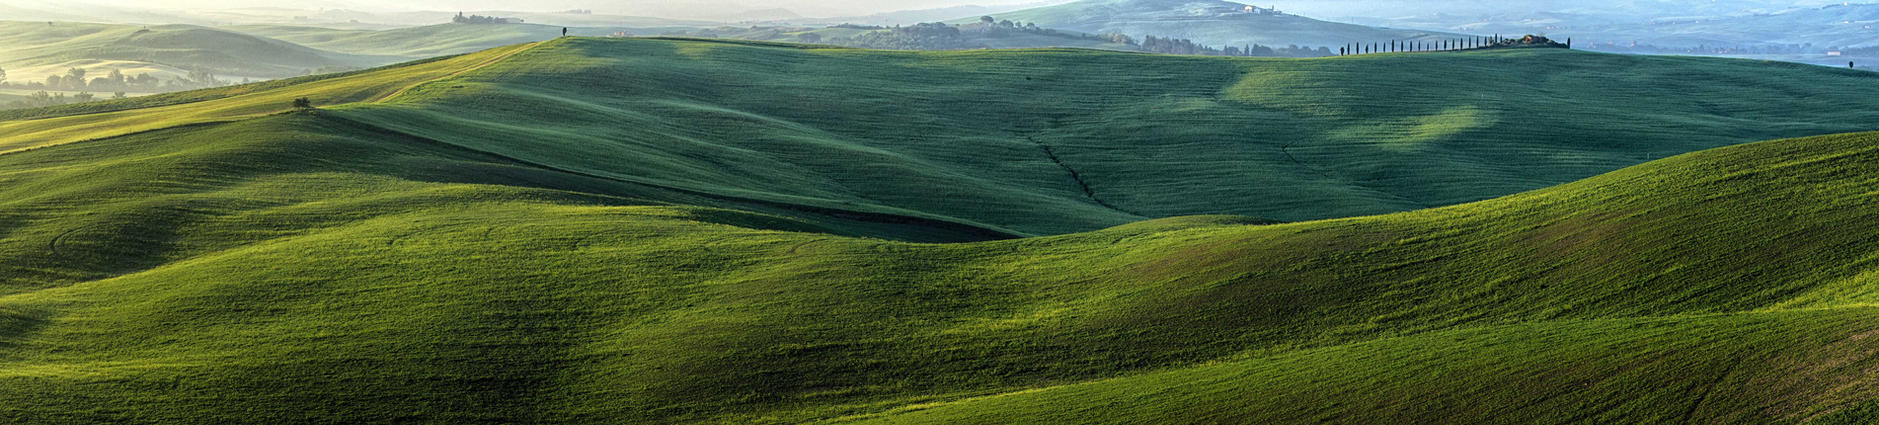 Magic Tuscany 16 by CitizenFresh